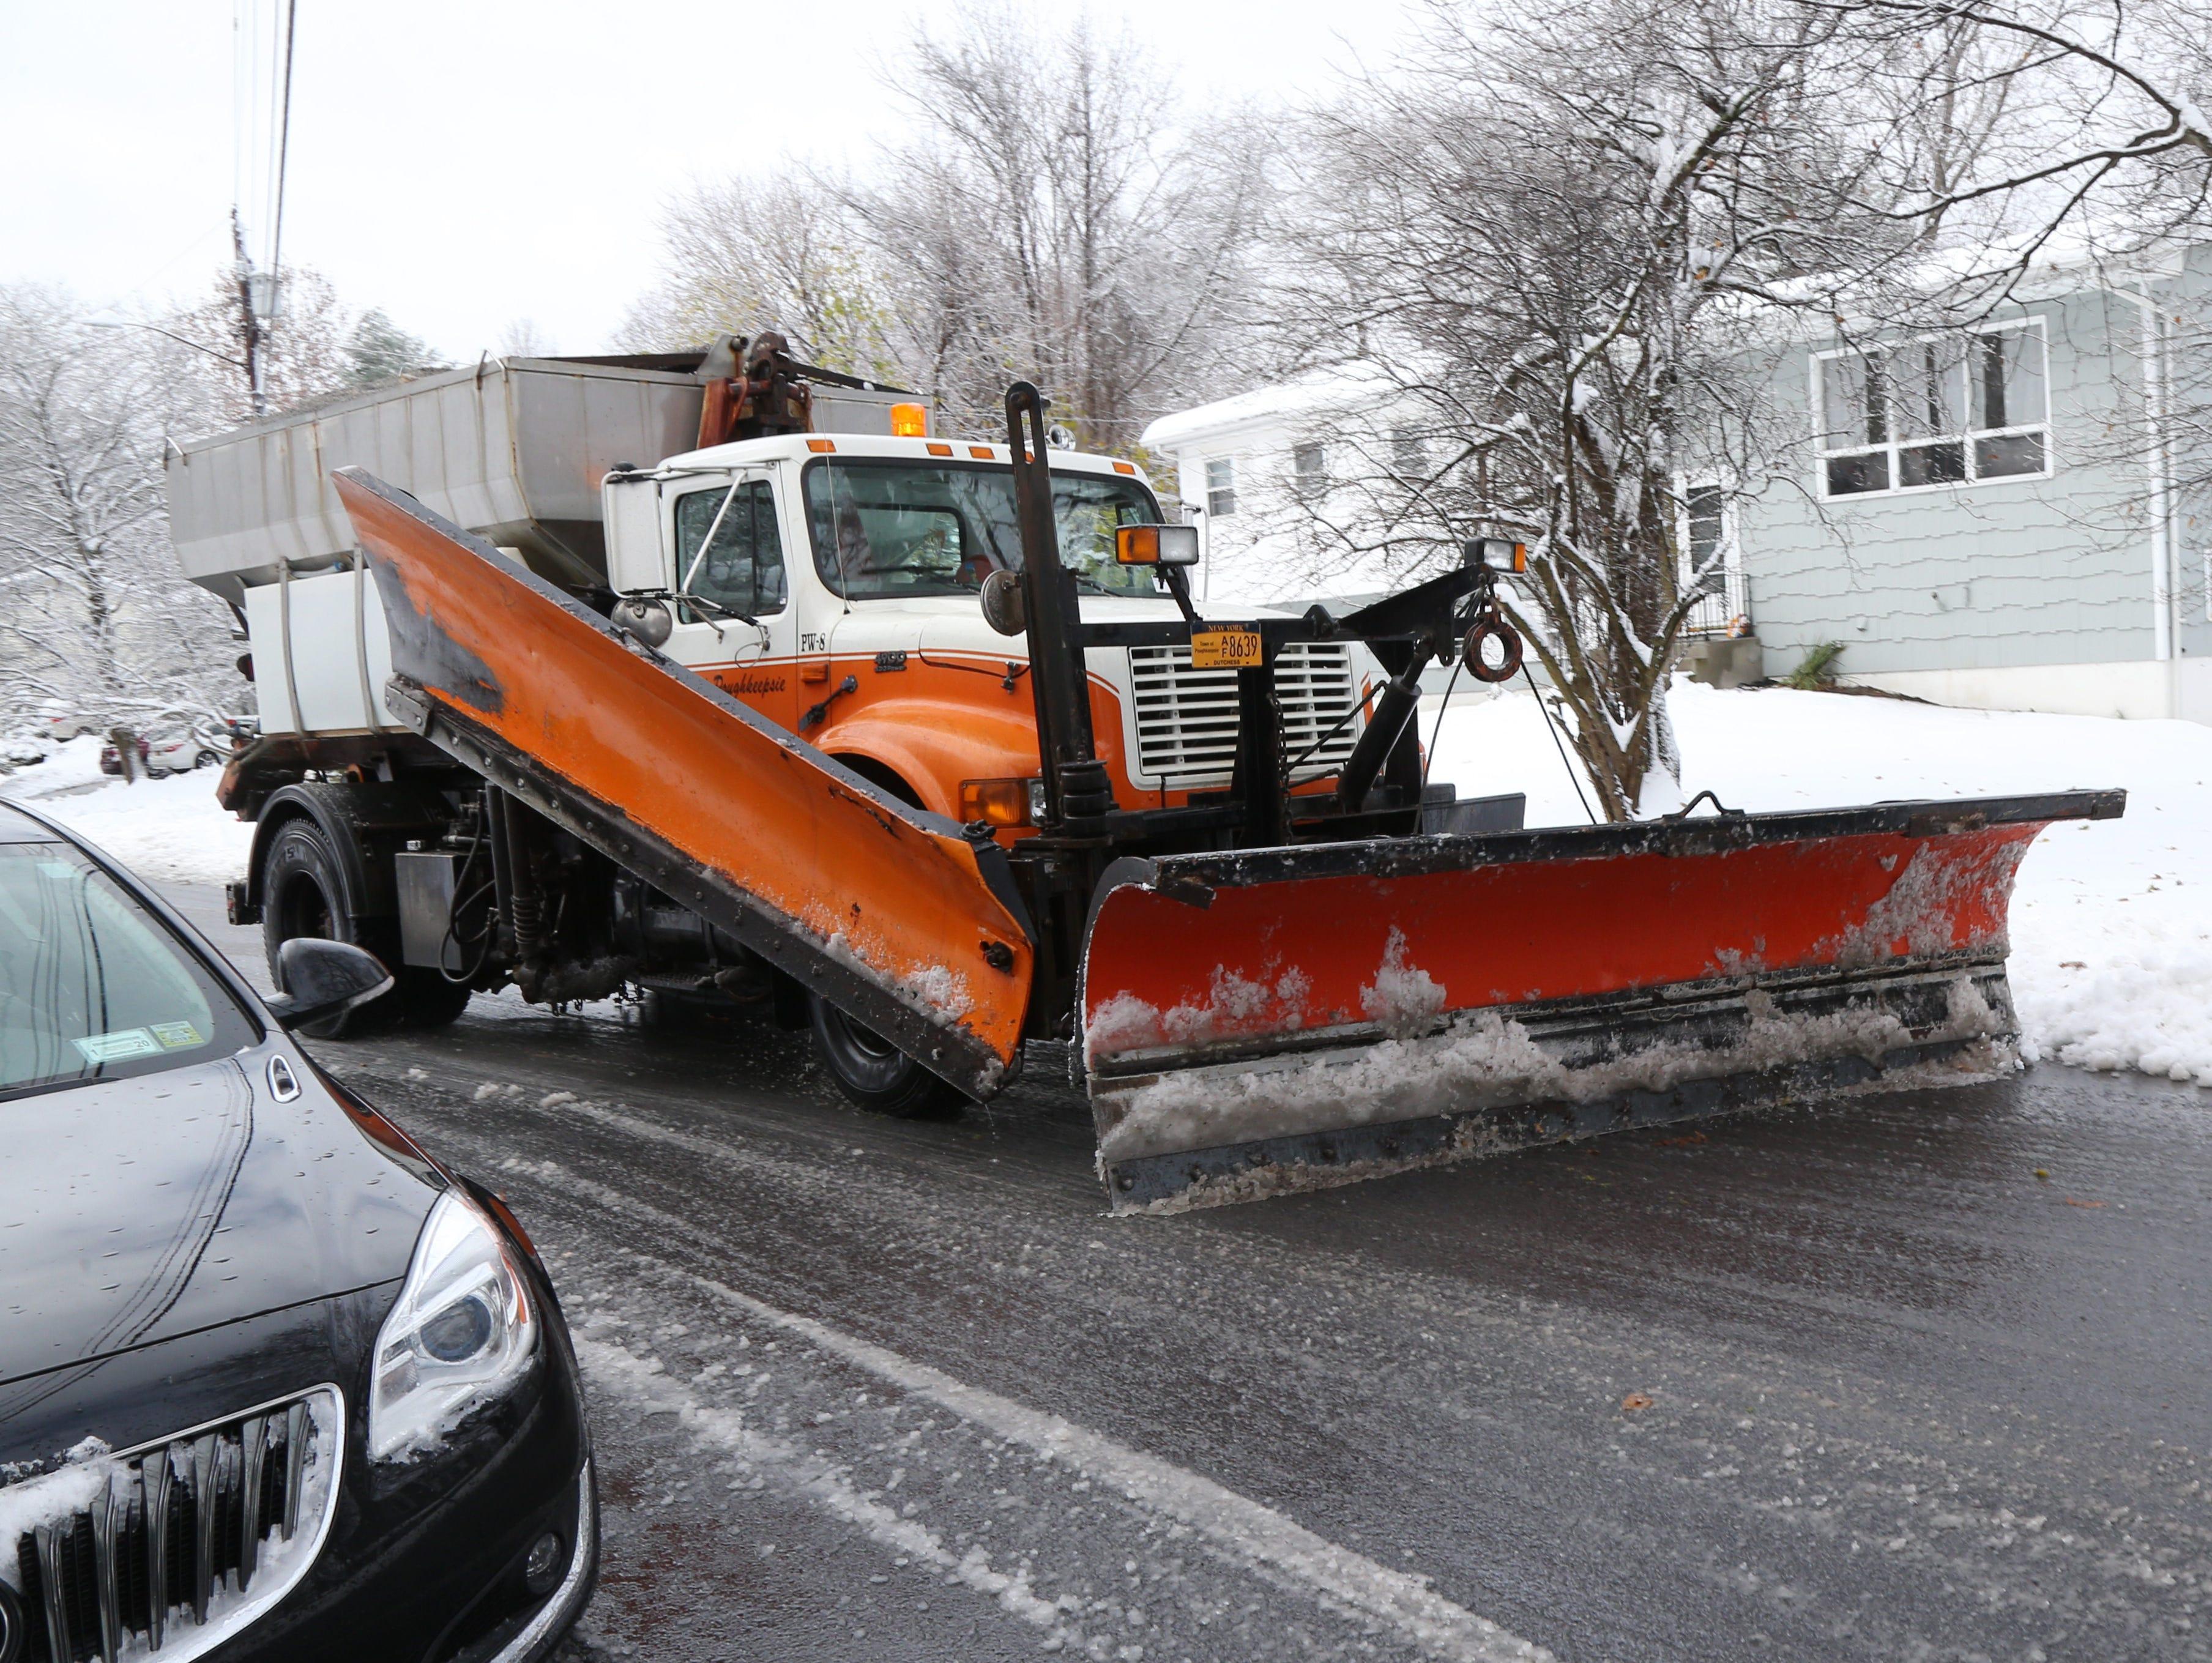 How was your commute? Snow wreaks havoc on roads